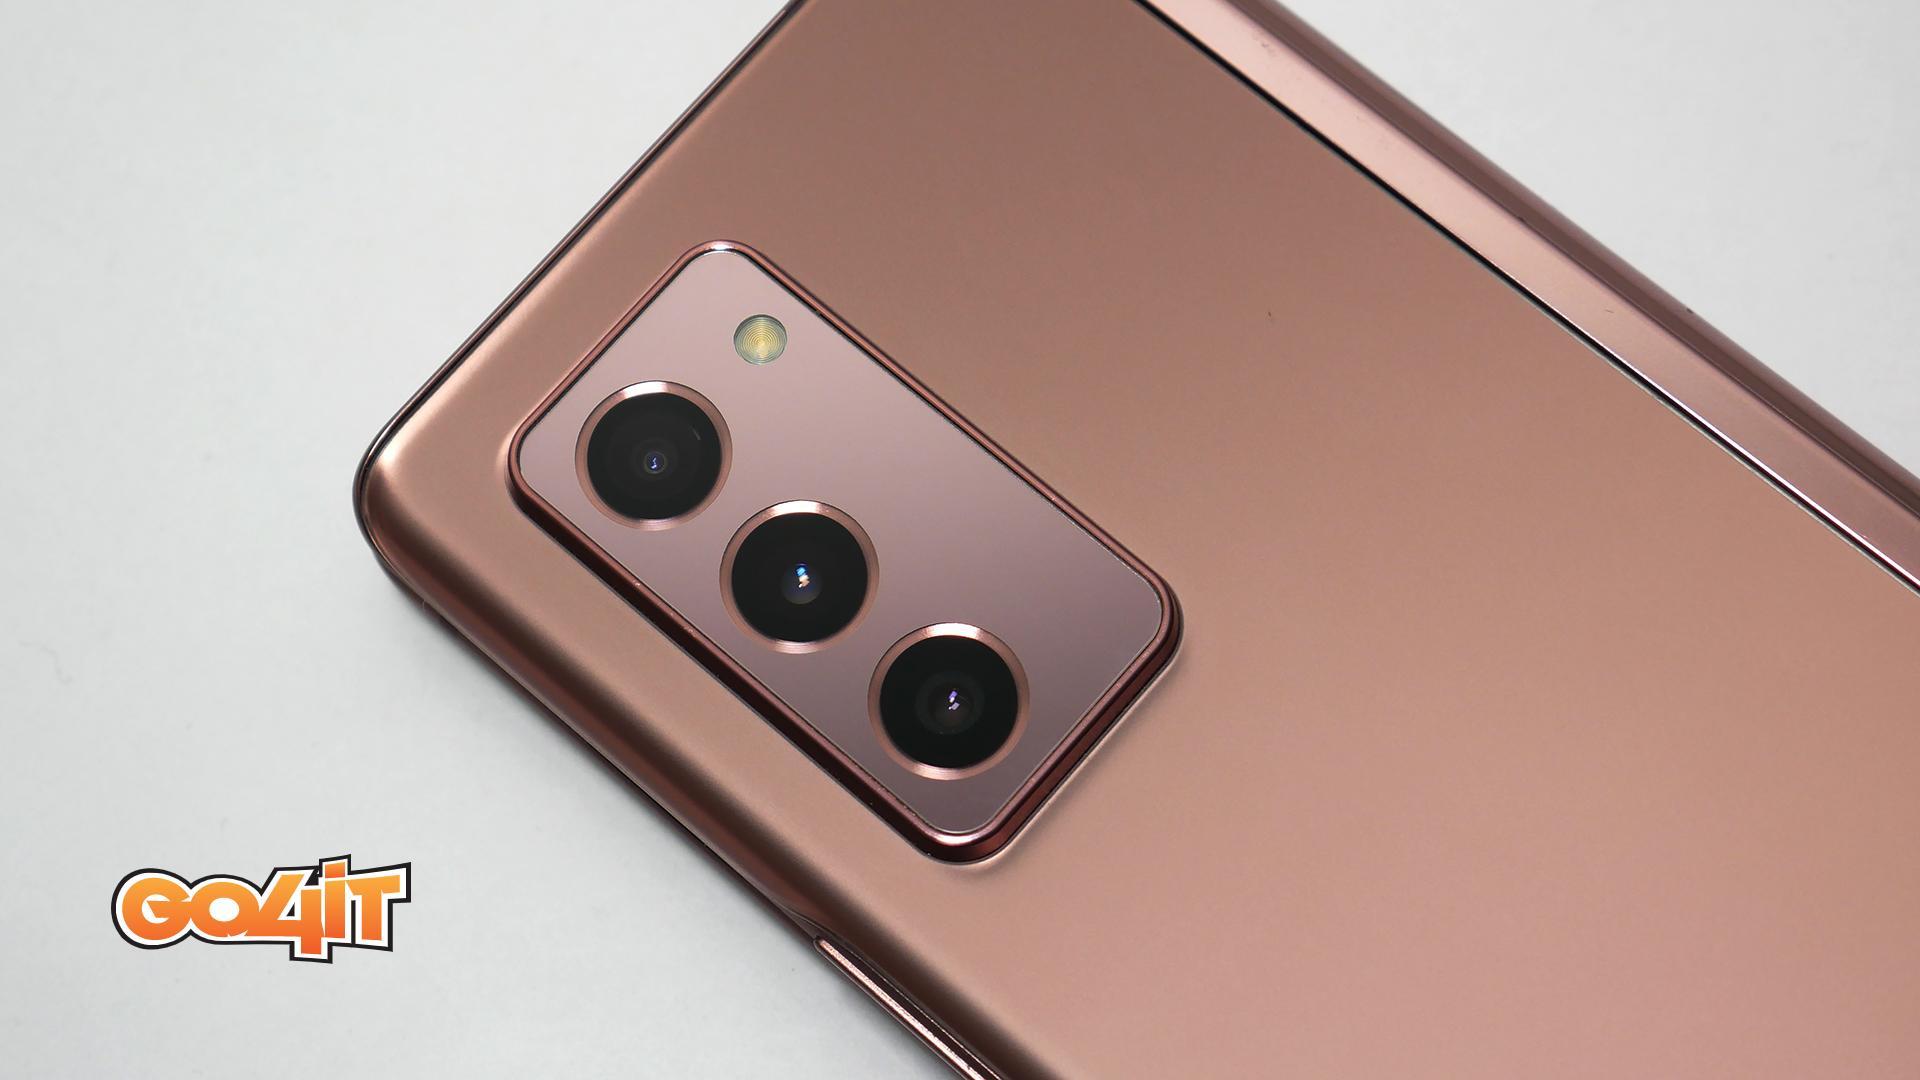 Samsung Galaxy Z Fold2 camera